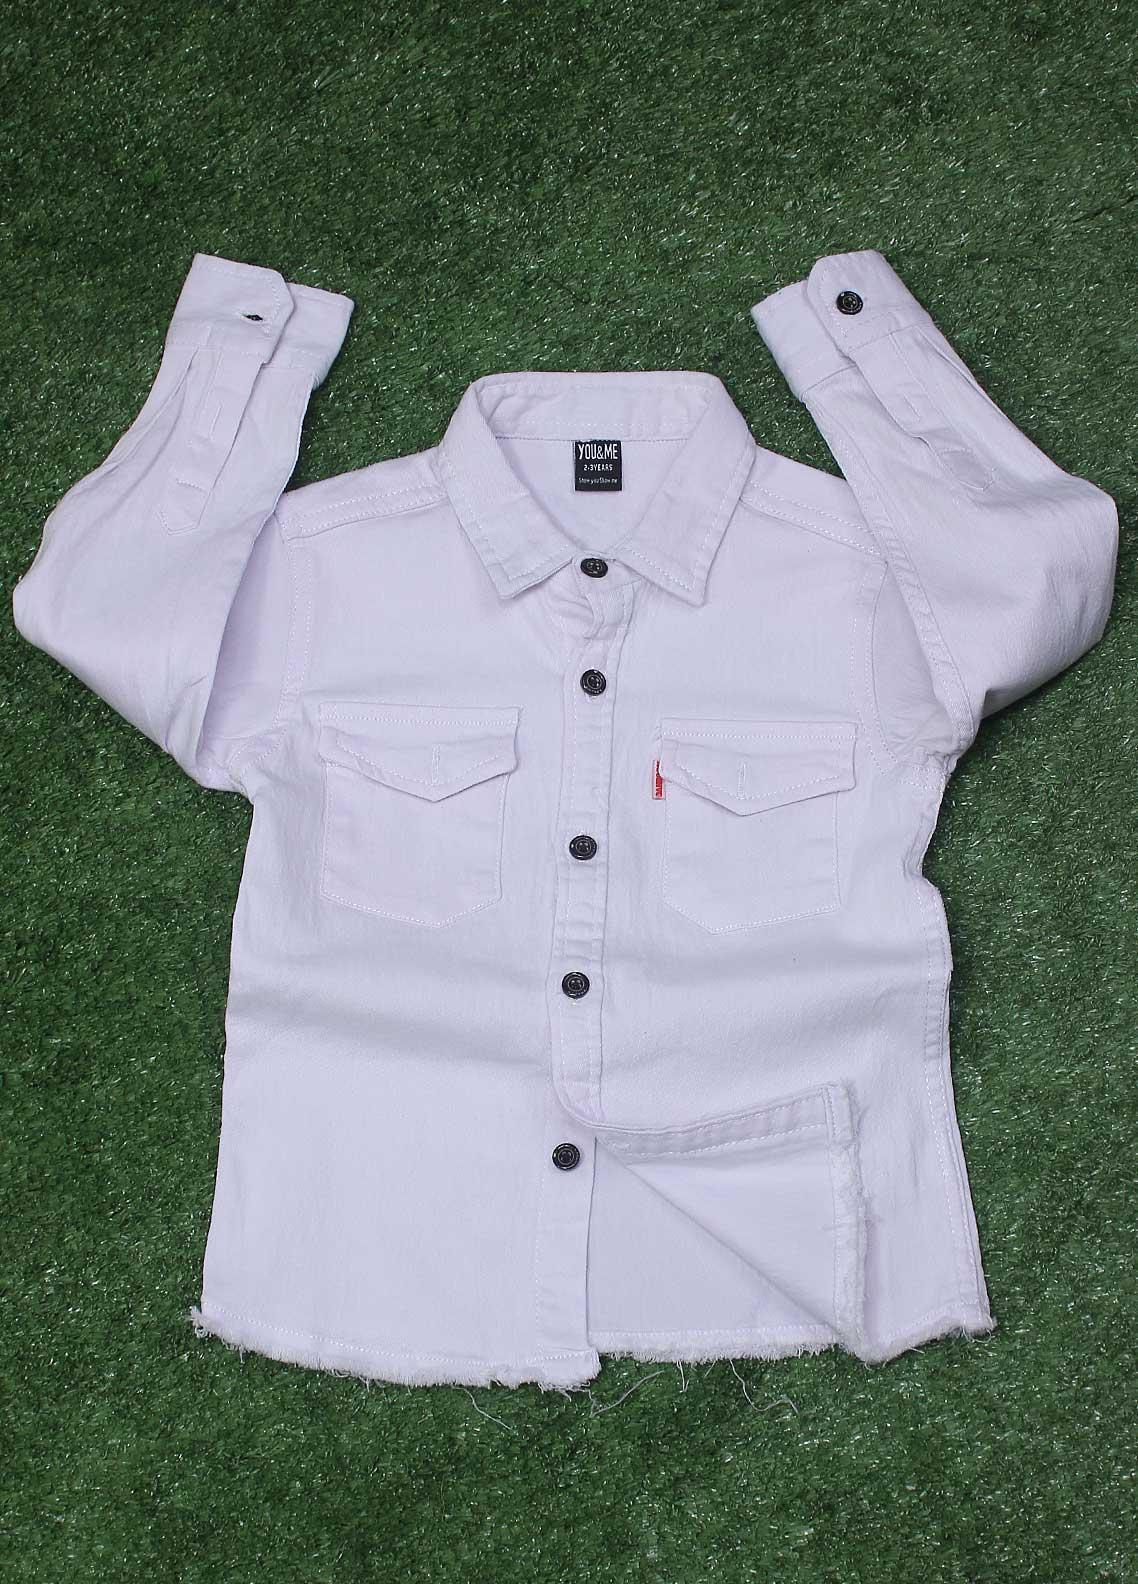 Sanaulla Exclusive Range  Fancy Shirt for Boys -  SU20BS  8156 White